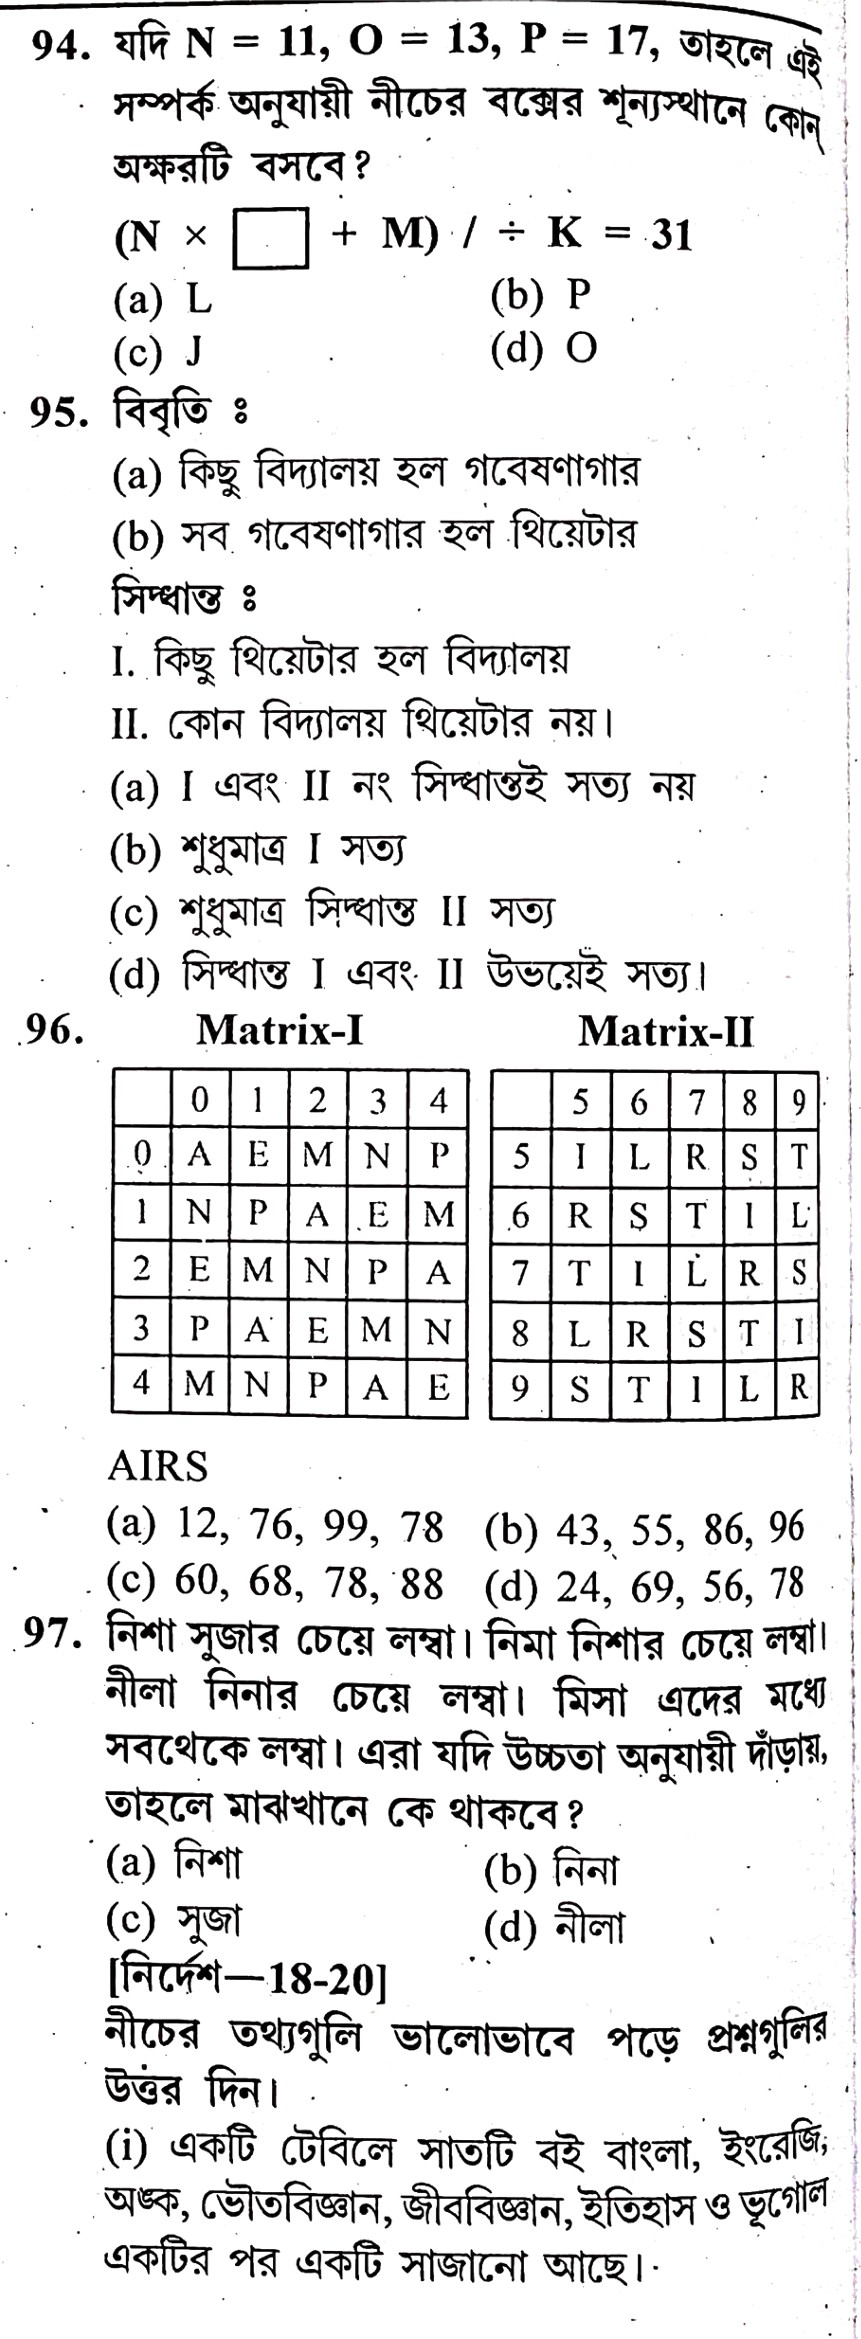 West Bengal Police Constable Preliminary Practice Set - 15 In Bengali || পশ্চিমবঙ্গ পুলিশ কনস্টেবল প্রিলিমিনারী প্র্যাকটিস সেট -১৫ - WBCS Notebook